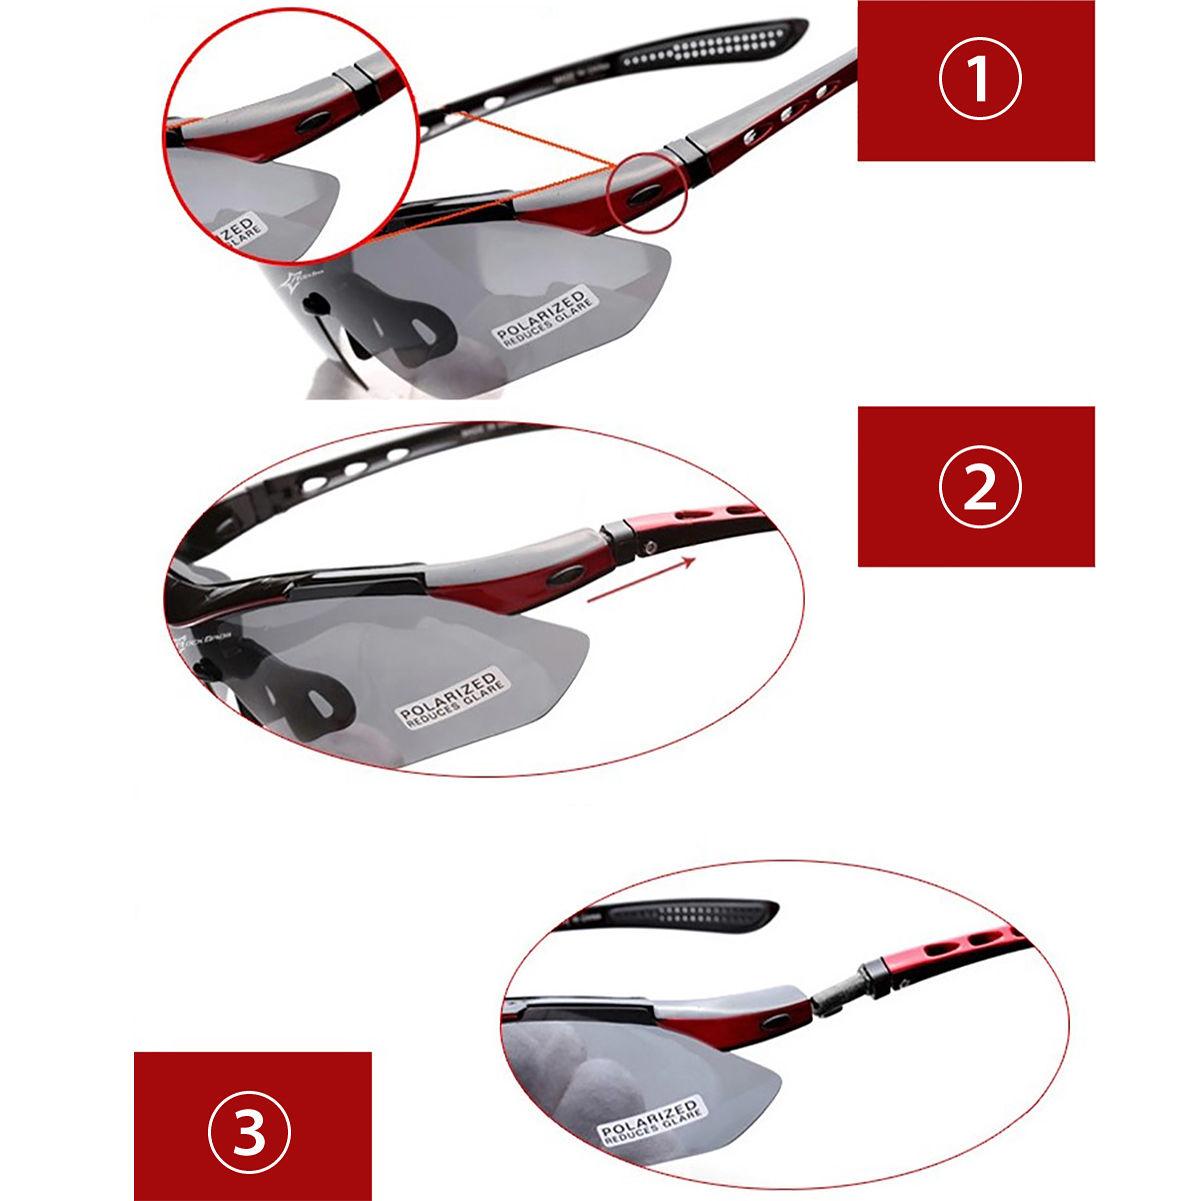 rockbros fahrrad brille sonnenbrille 5wechselgl ser rennrad rad sportbrille cs10 ebay. Black Bedroom Furniture Sets. Home Design Ideas